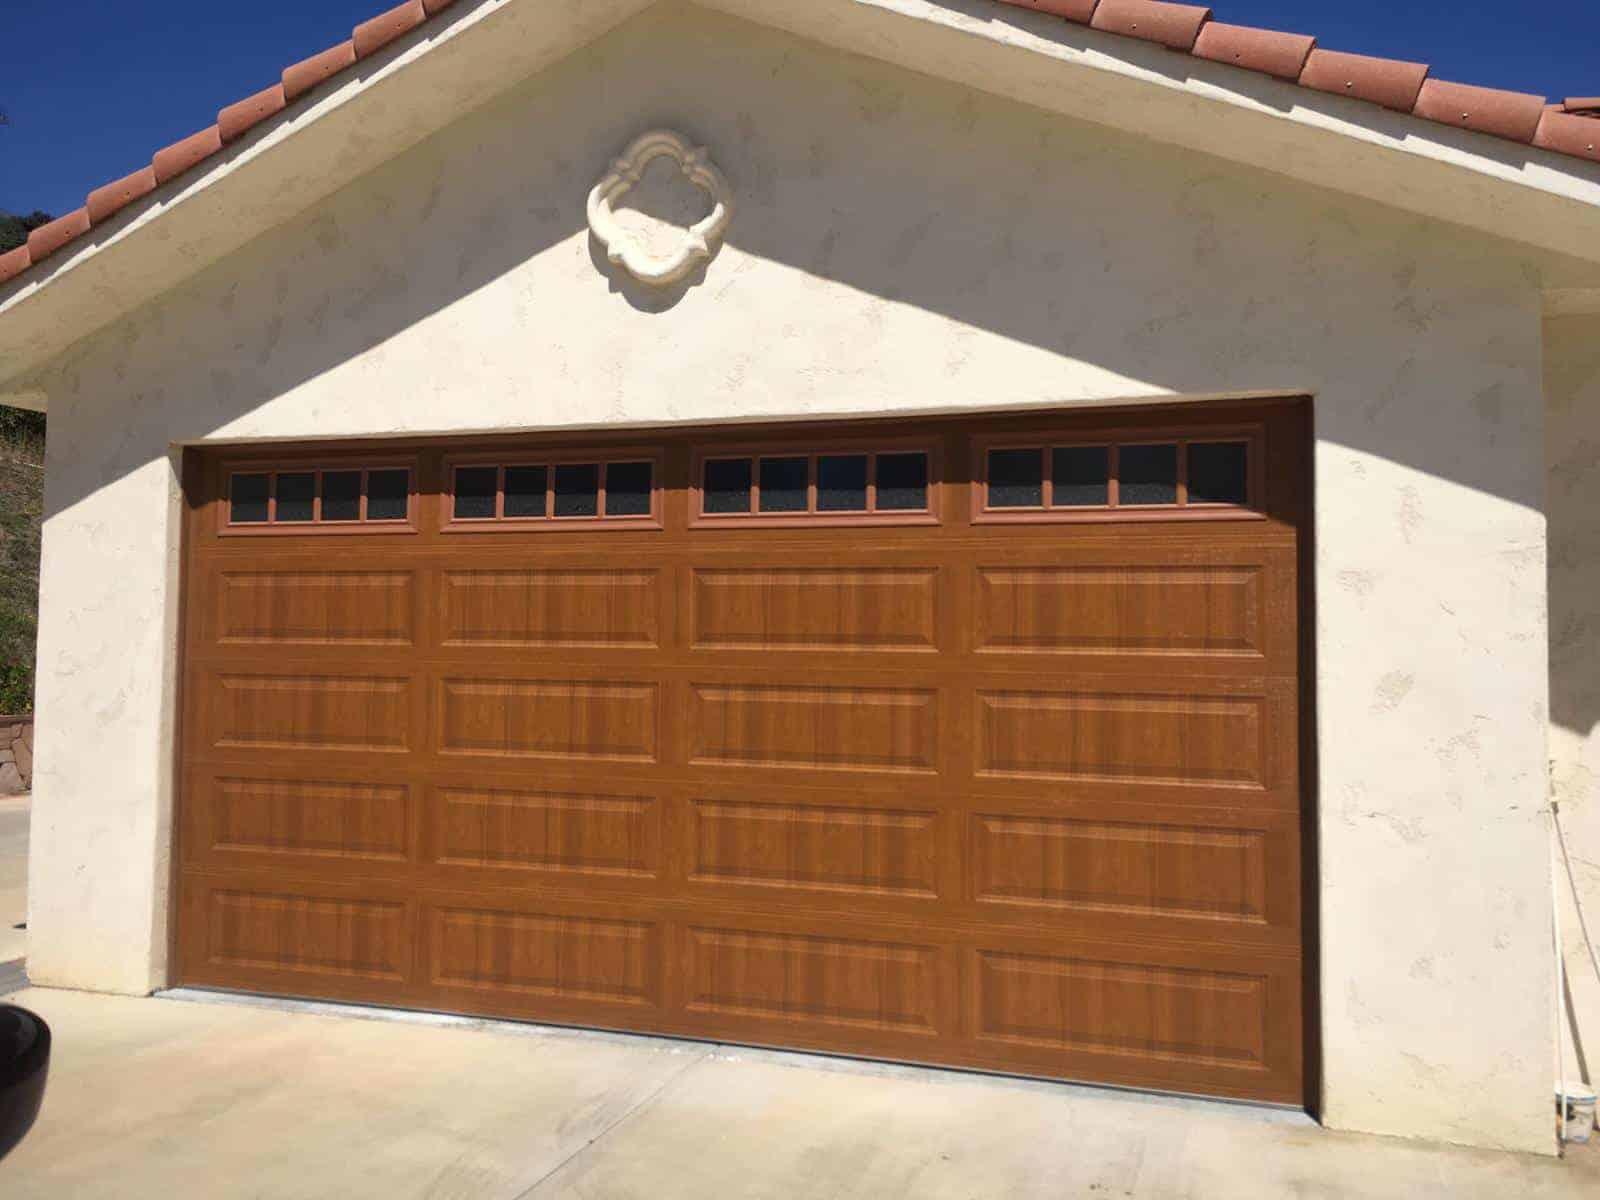 Garage Door Repair Experts in Farmington